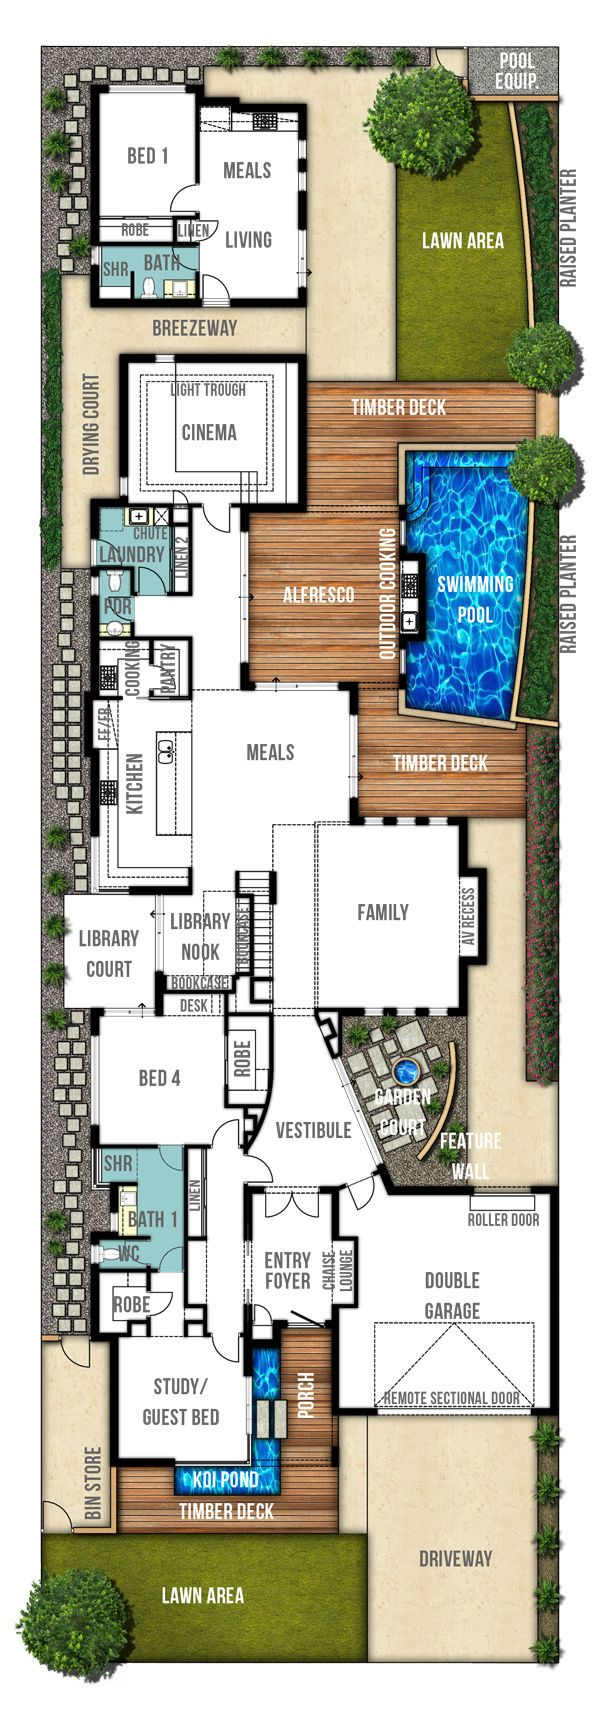 two storey home plans ground floor design - Ground Floor Plans House